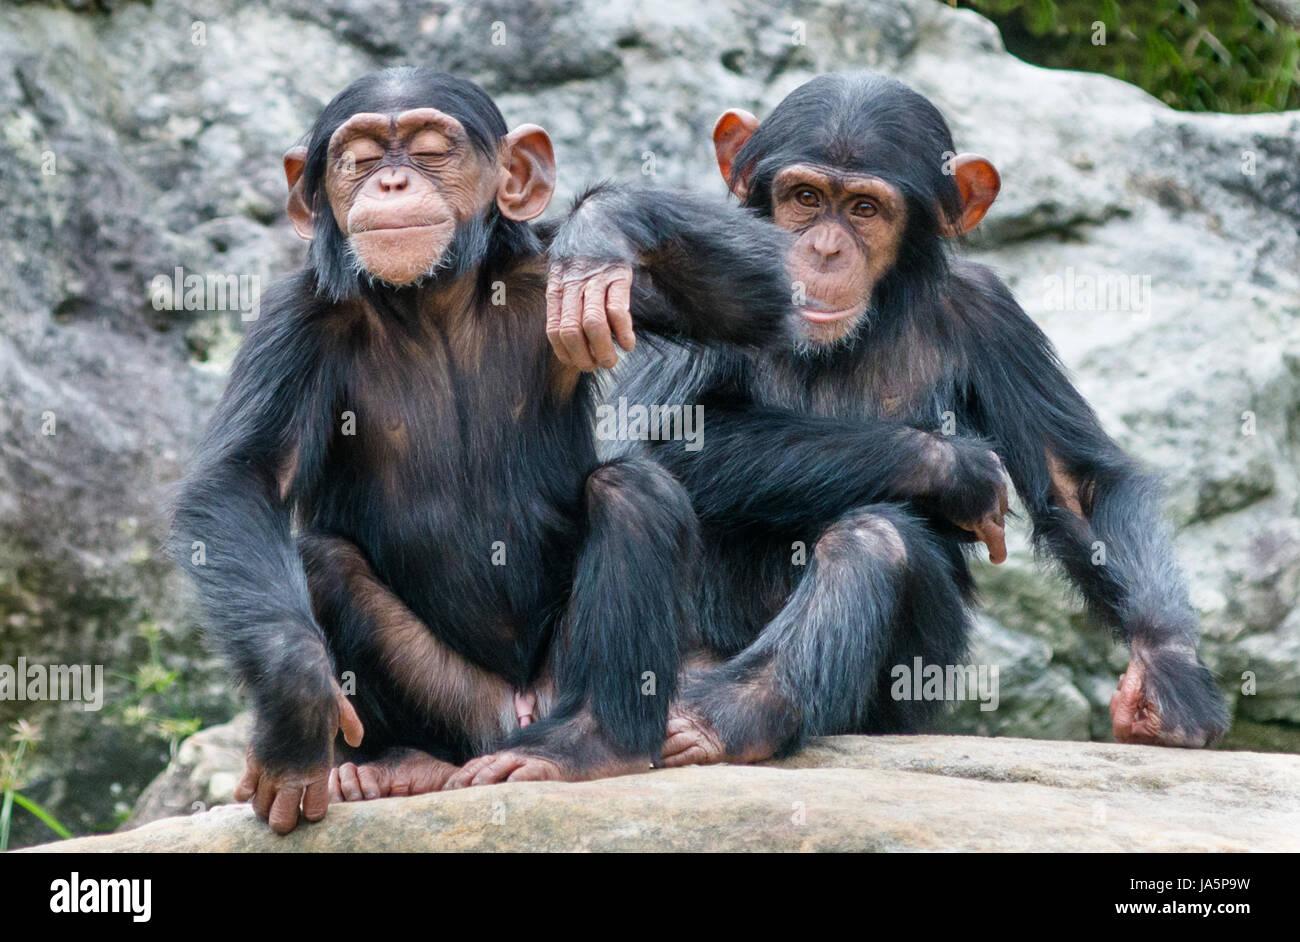 Chimpanzees Stock Photos & Chimpanzees Stock Images - Alamy